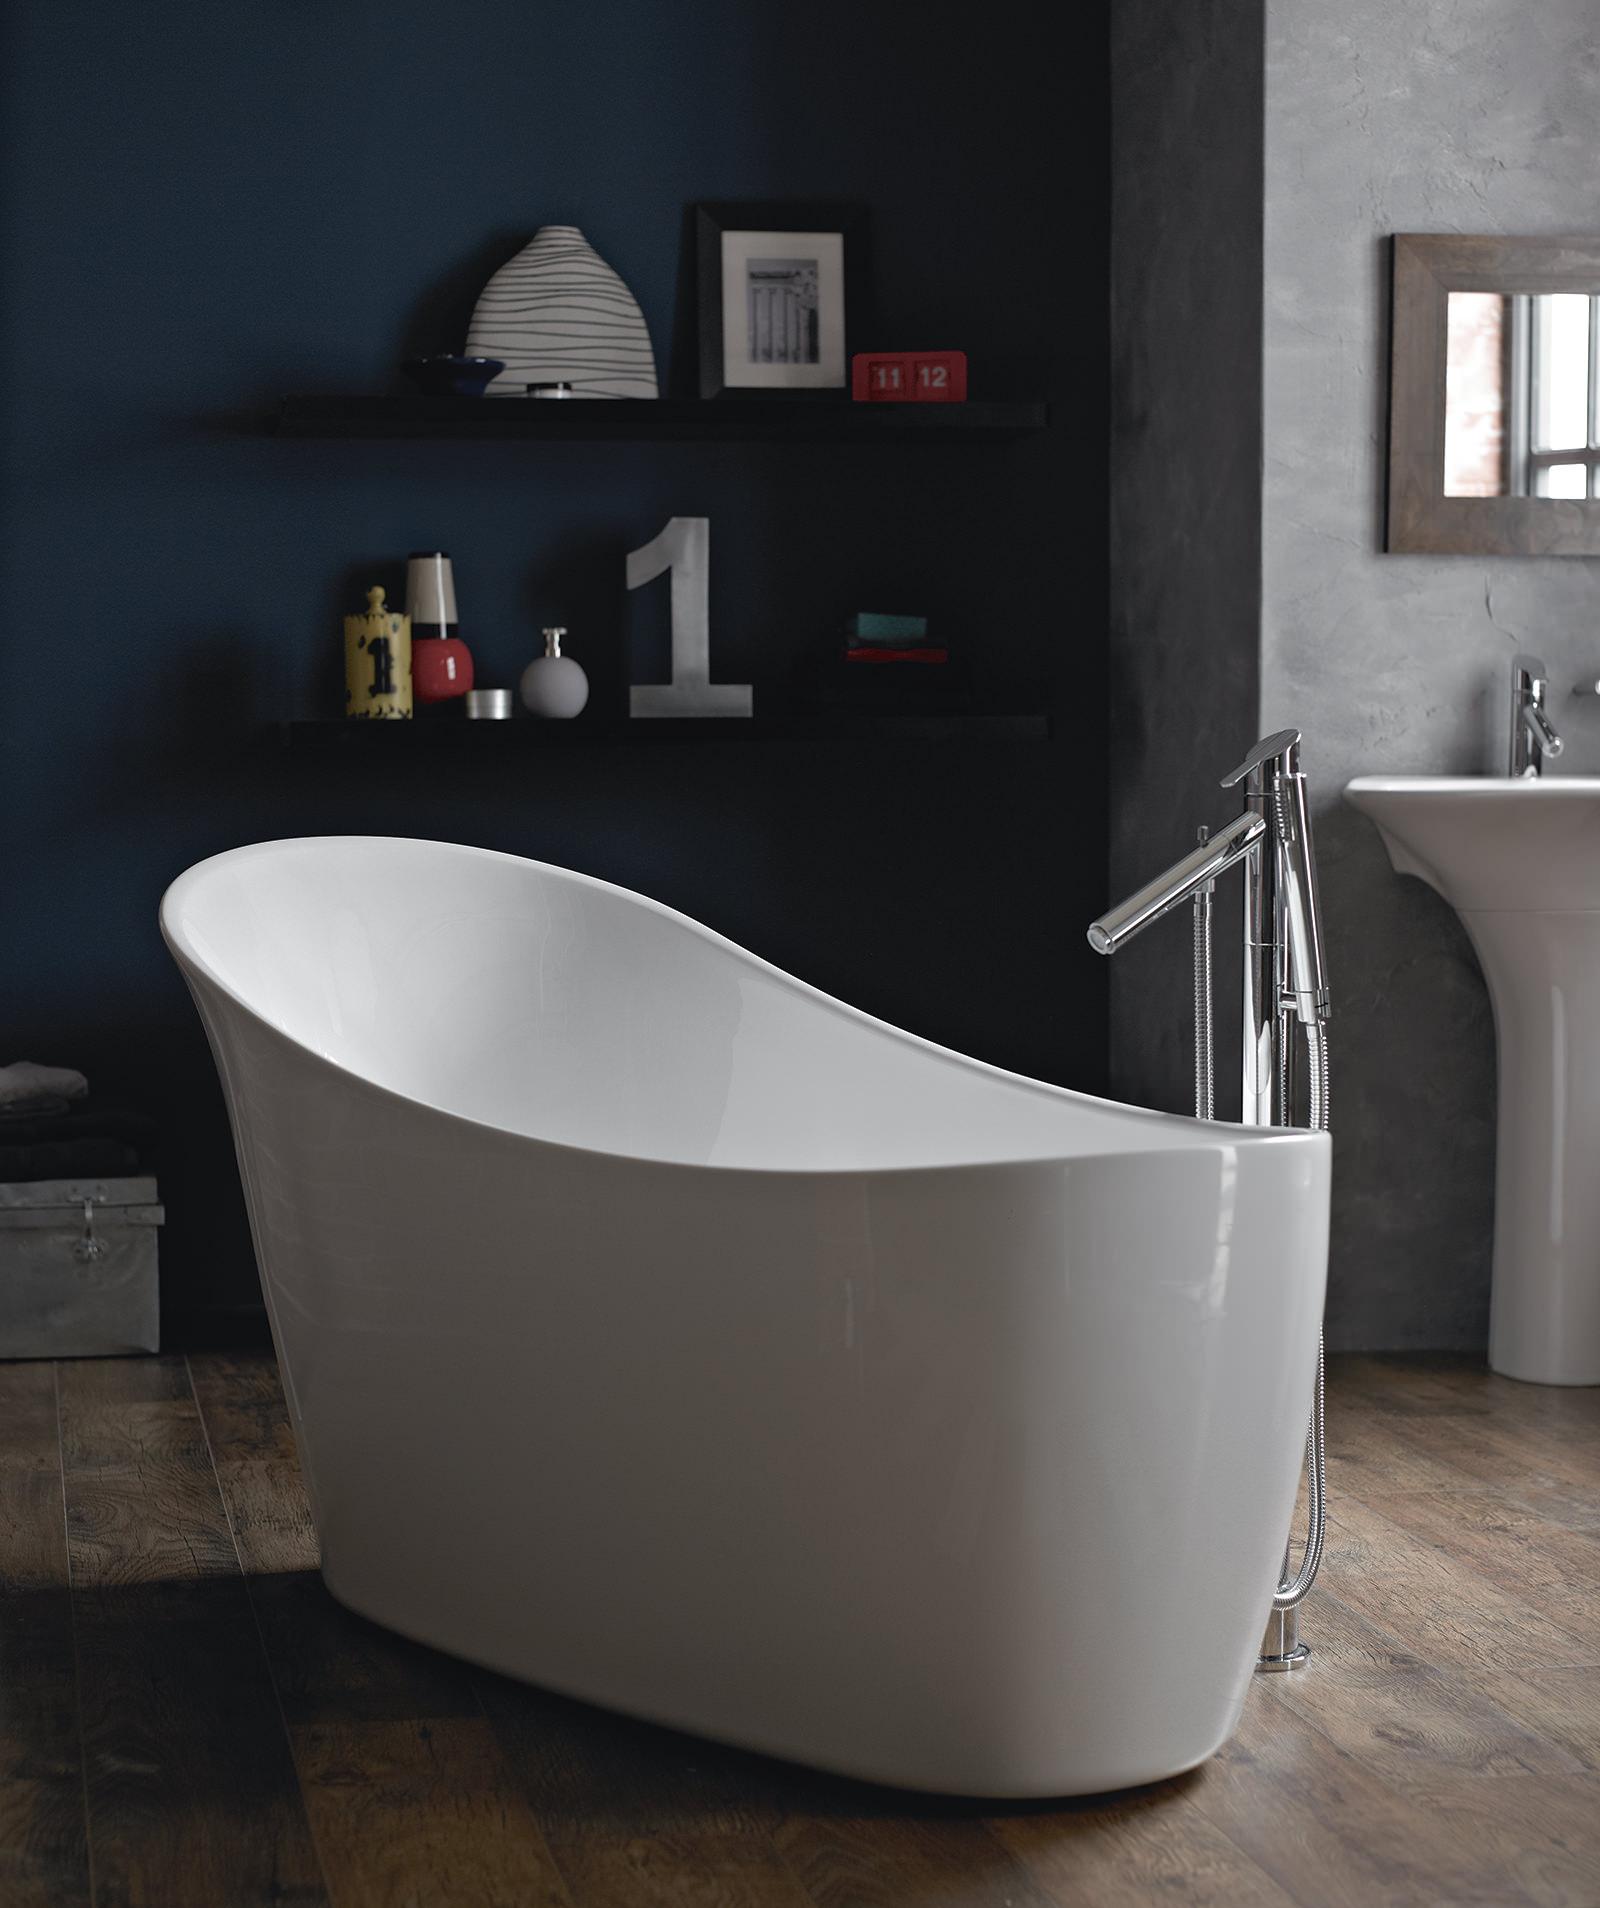 Slipper Bath Uk Heritage polperro freestanding slipper bath 1590 x 680mm bkfsw01 heritage polperro freestanding slipper bath 1590 x 680mm sisterspd